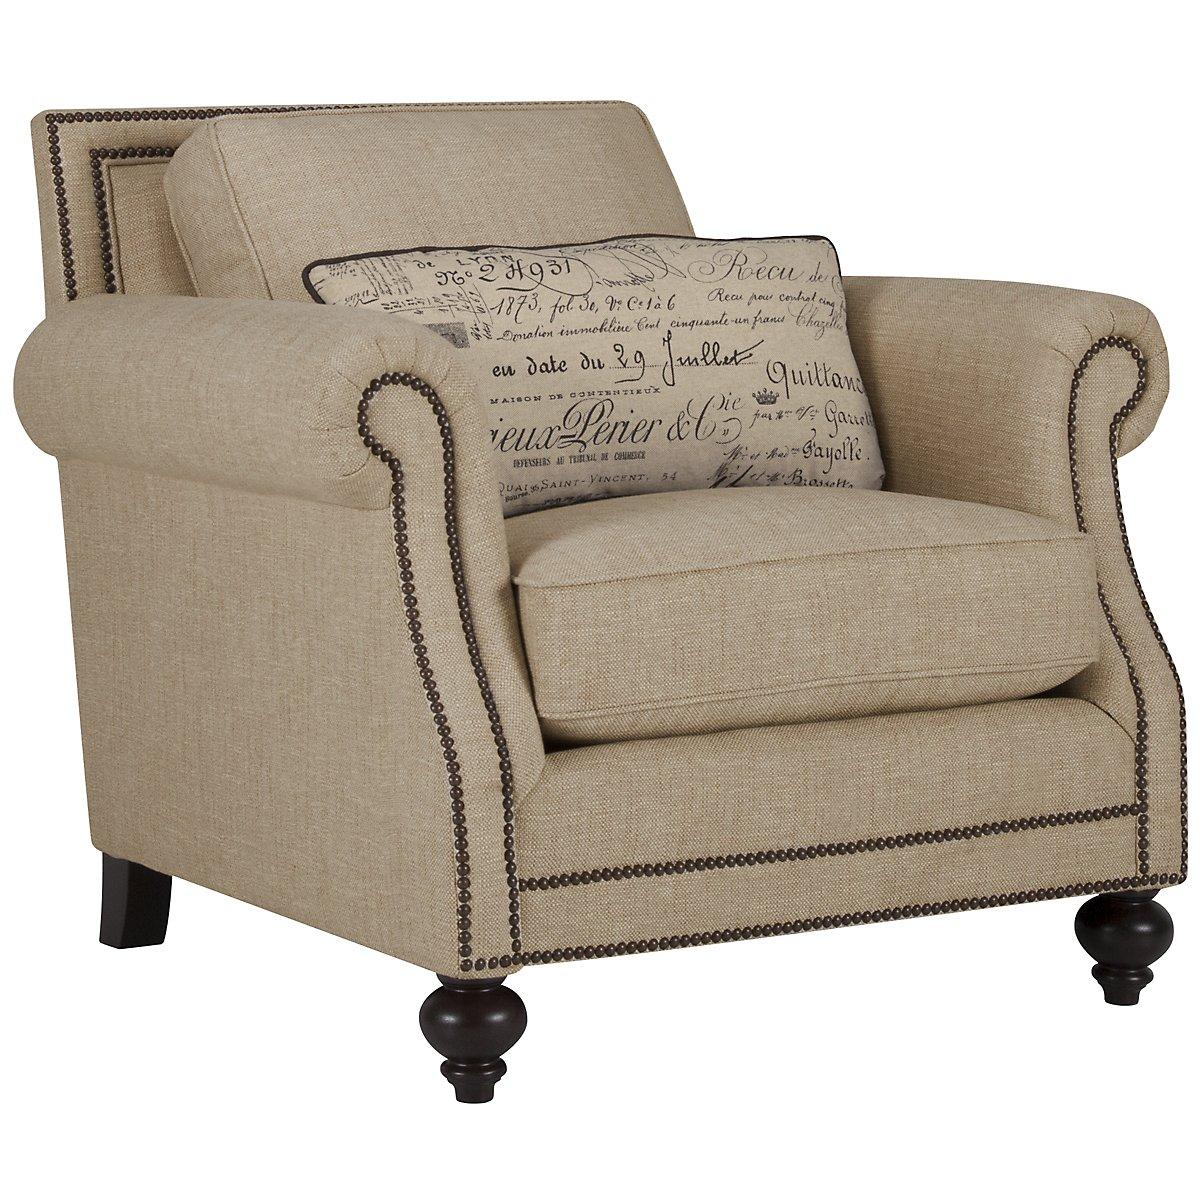 Brae Beige Fabric Chair